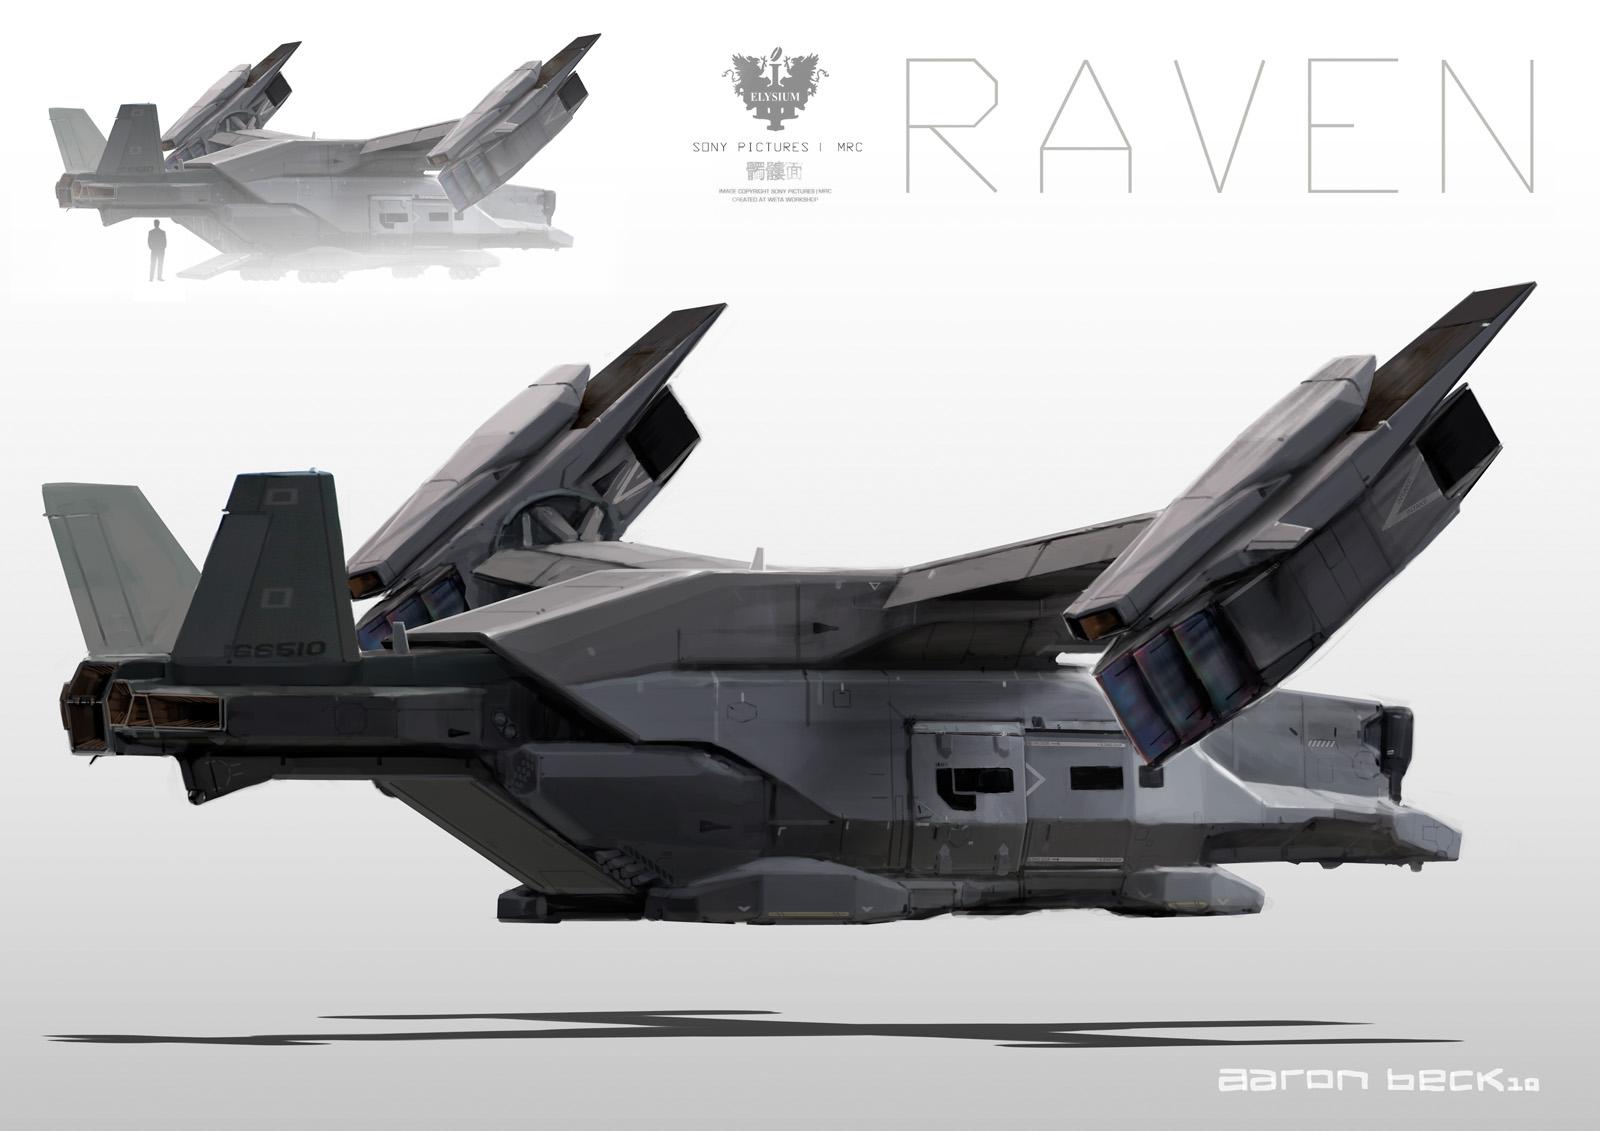 raven_edit_02.jpg